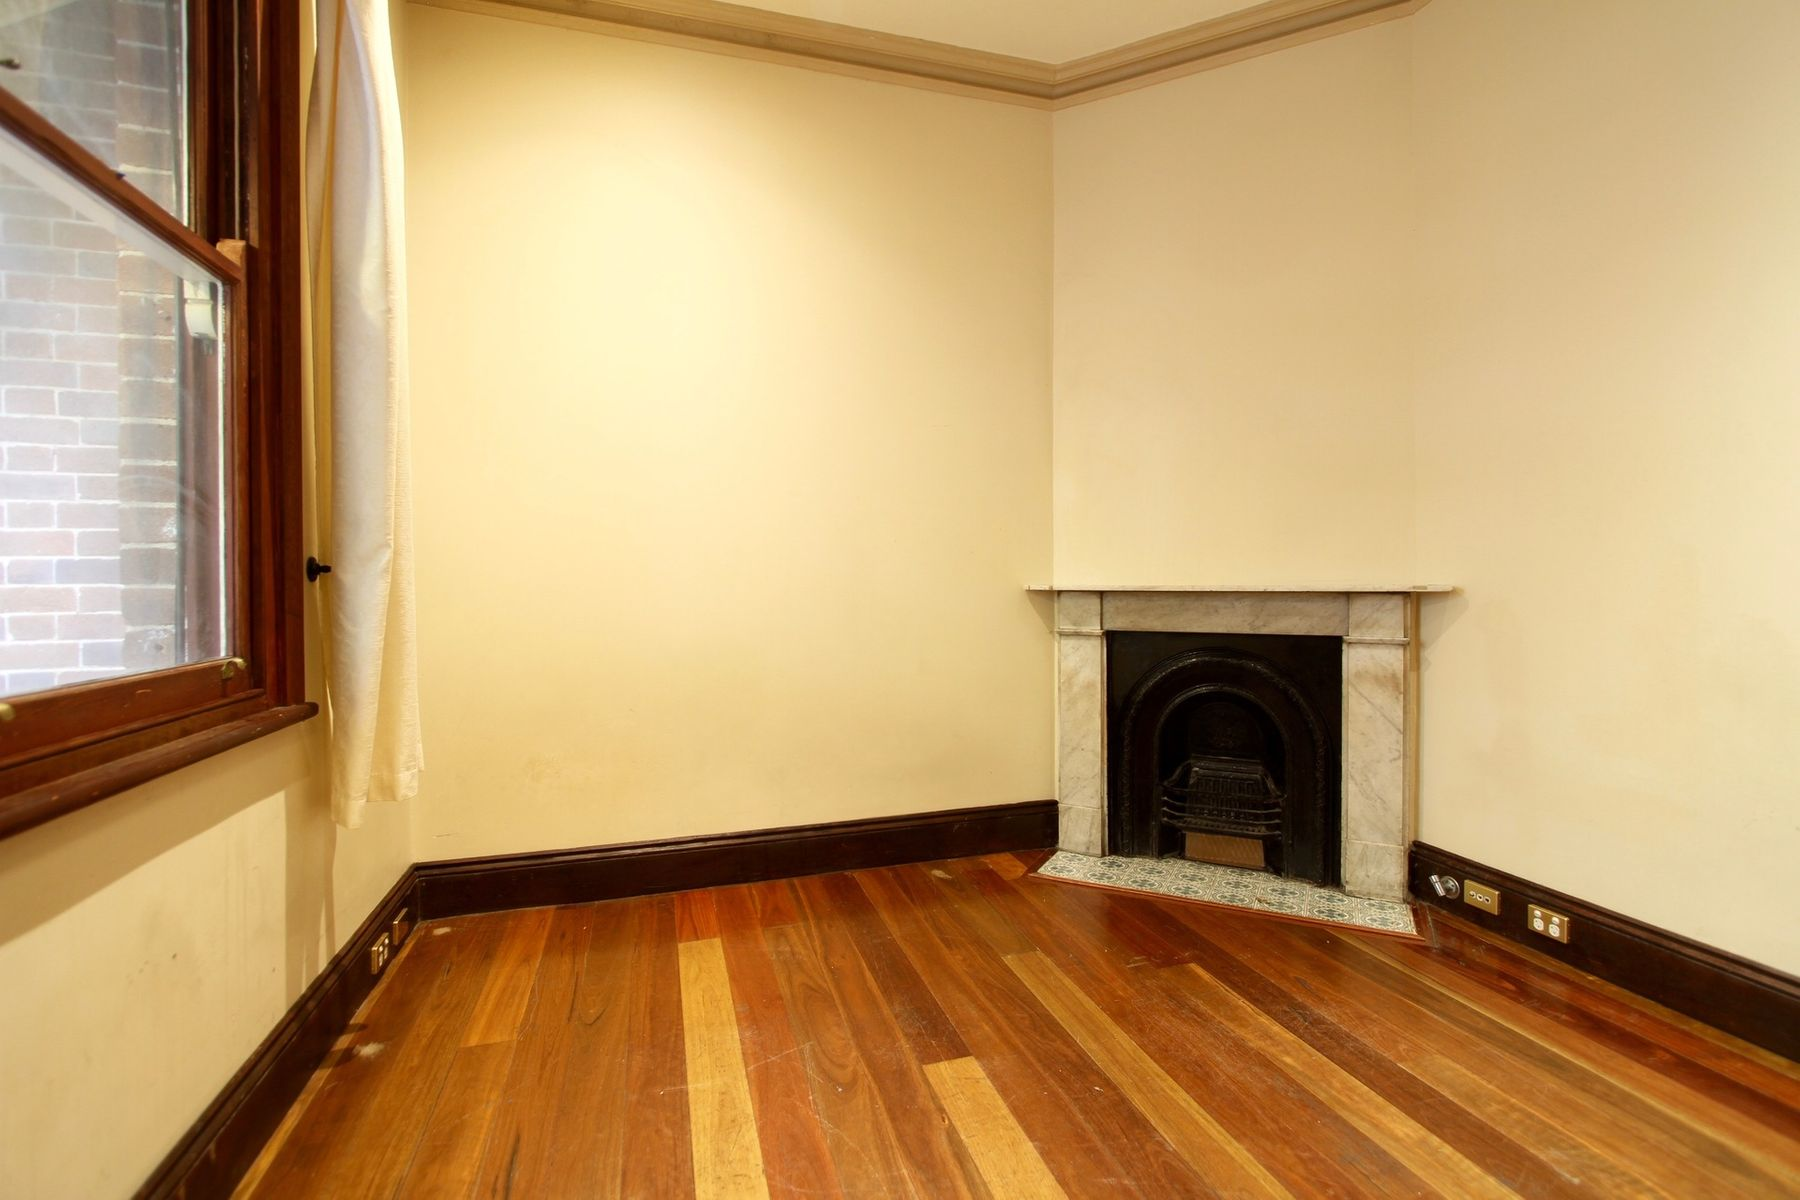 144 Pyrmont Street, Pyrmont, NSW 2009